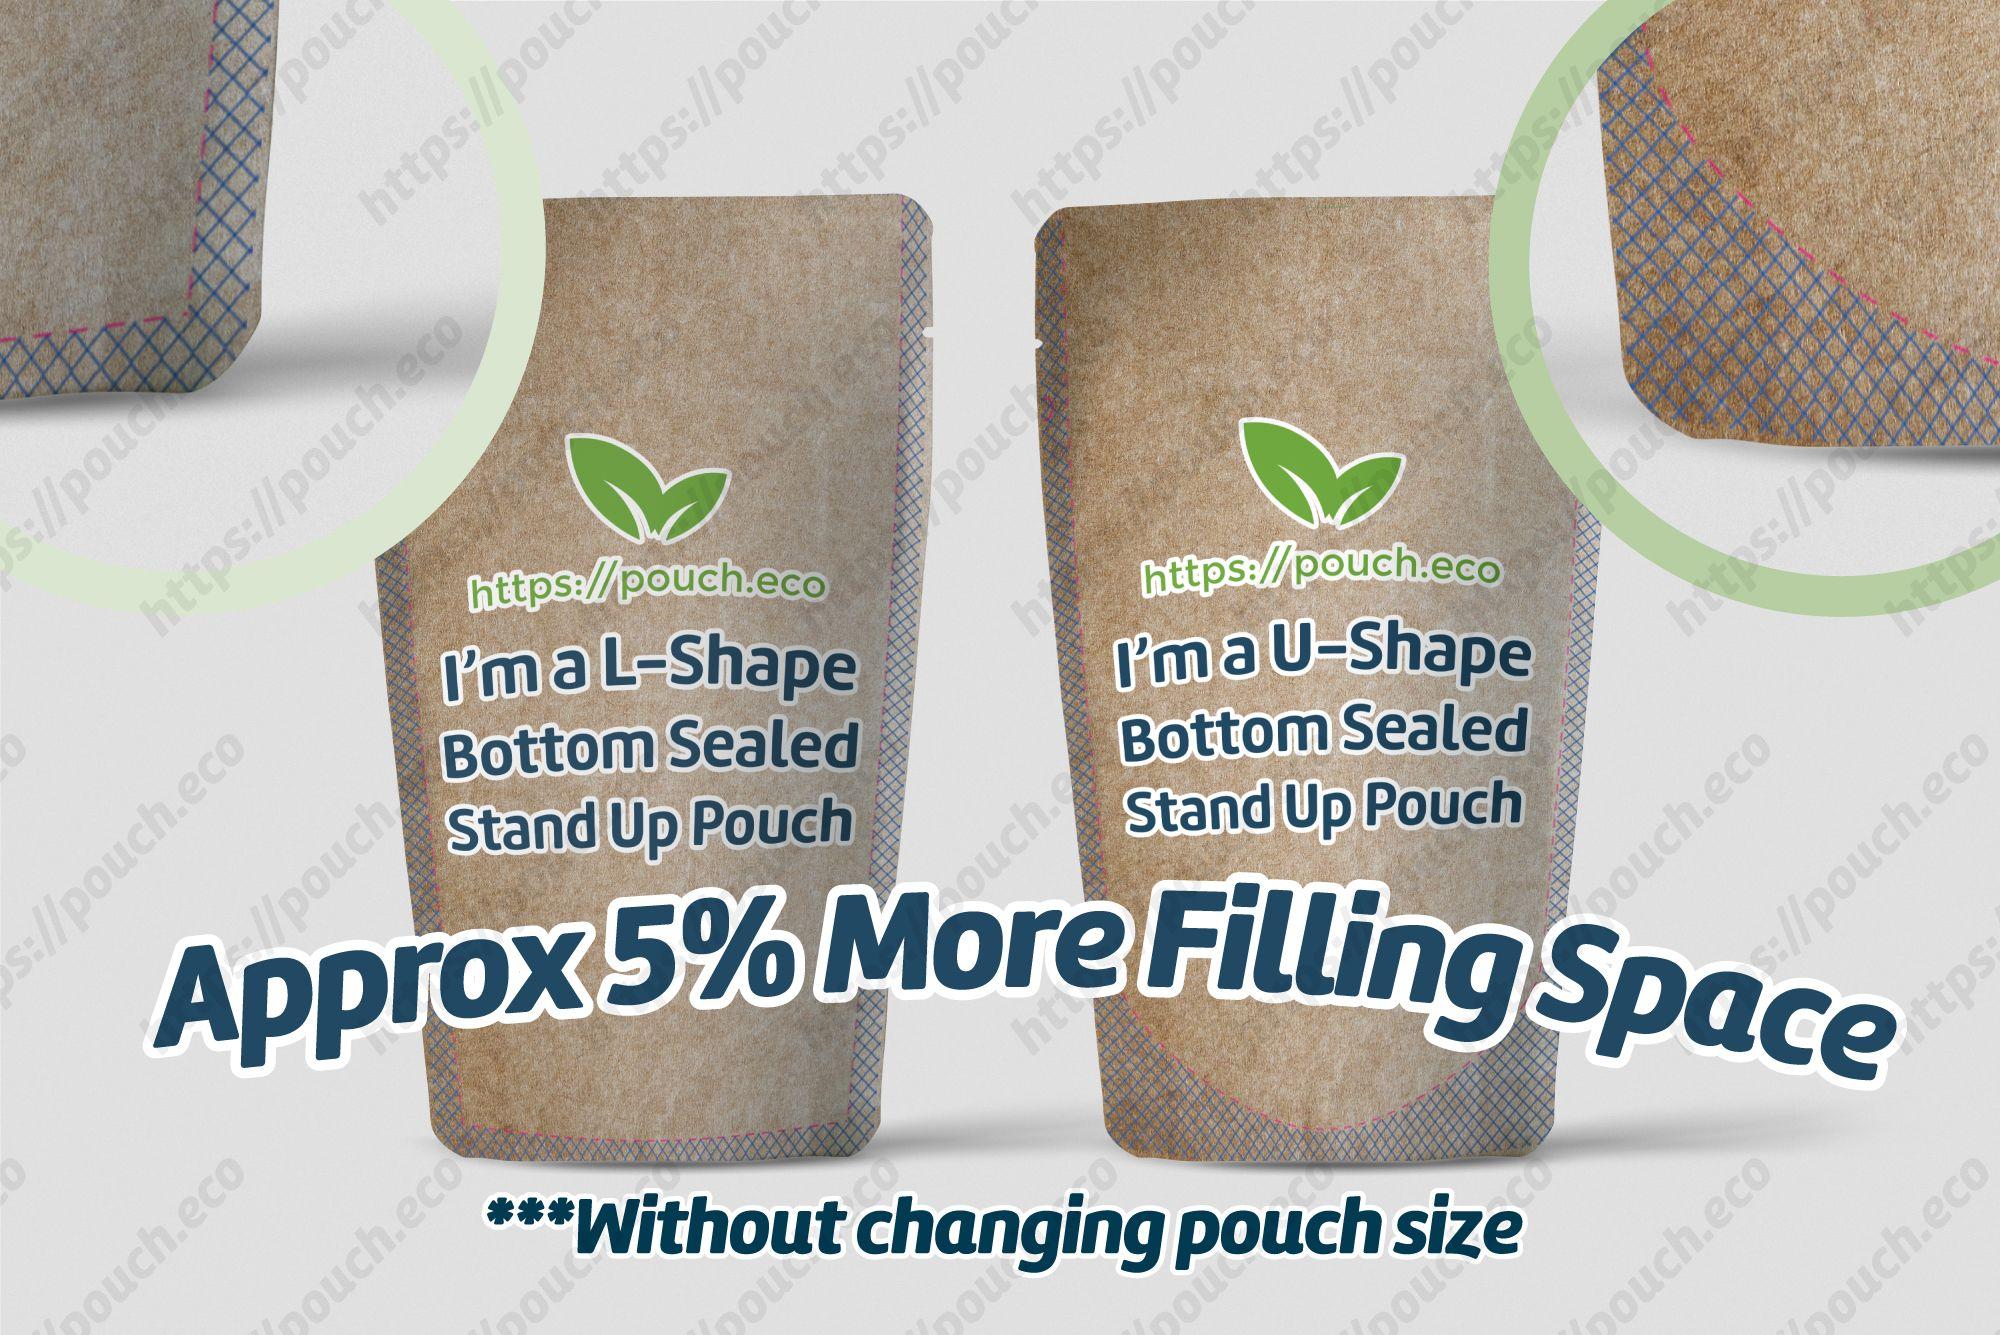 U shape sealed vs L shape sealed bottom of Stand up pouch